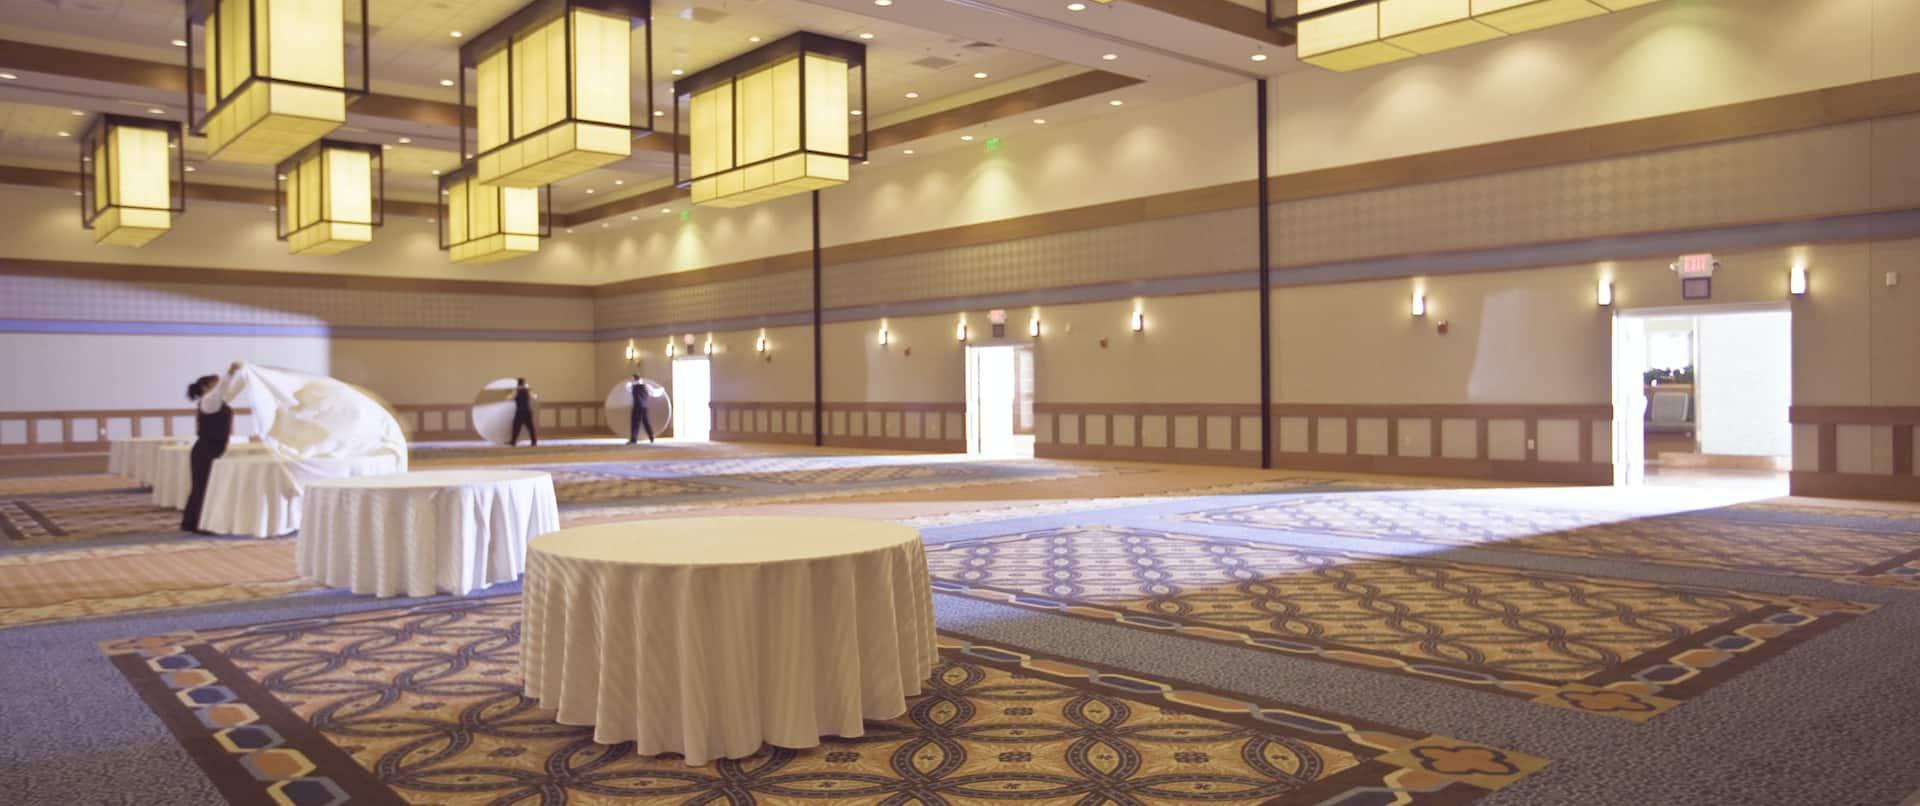 Fiesta Ballroom